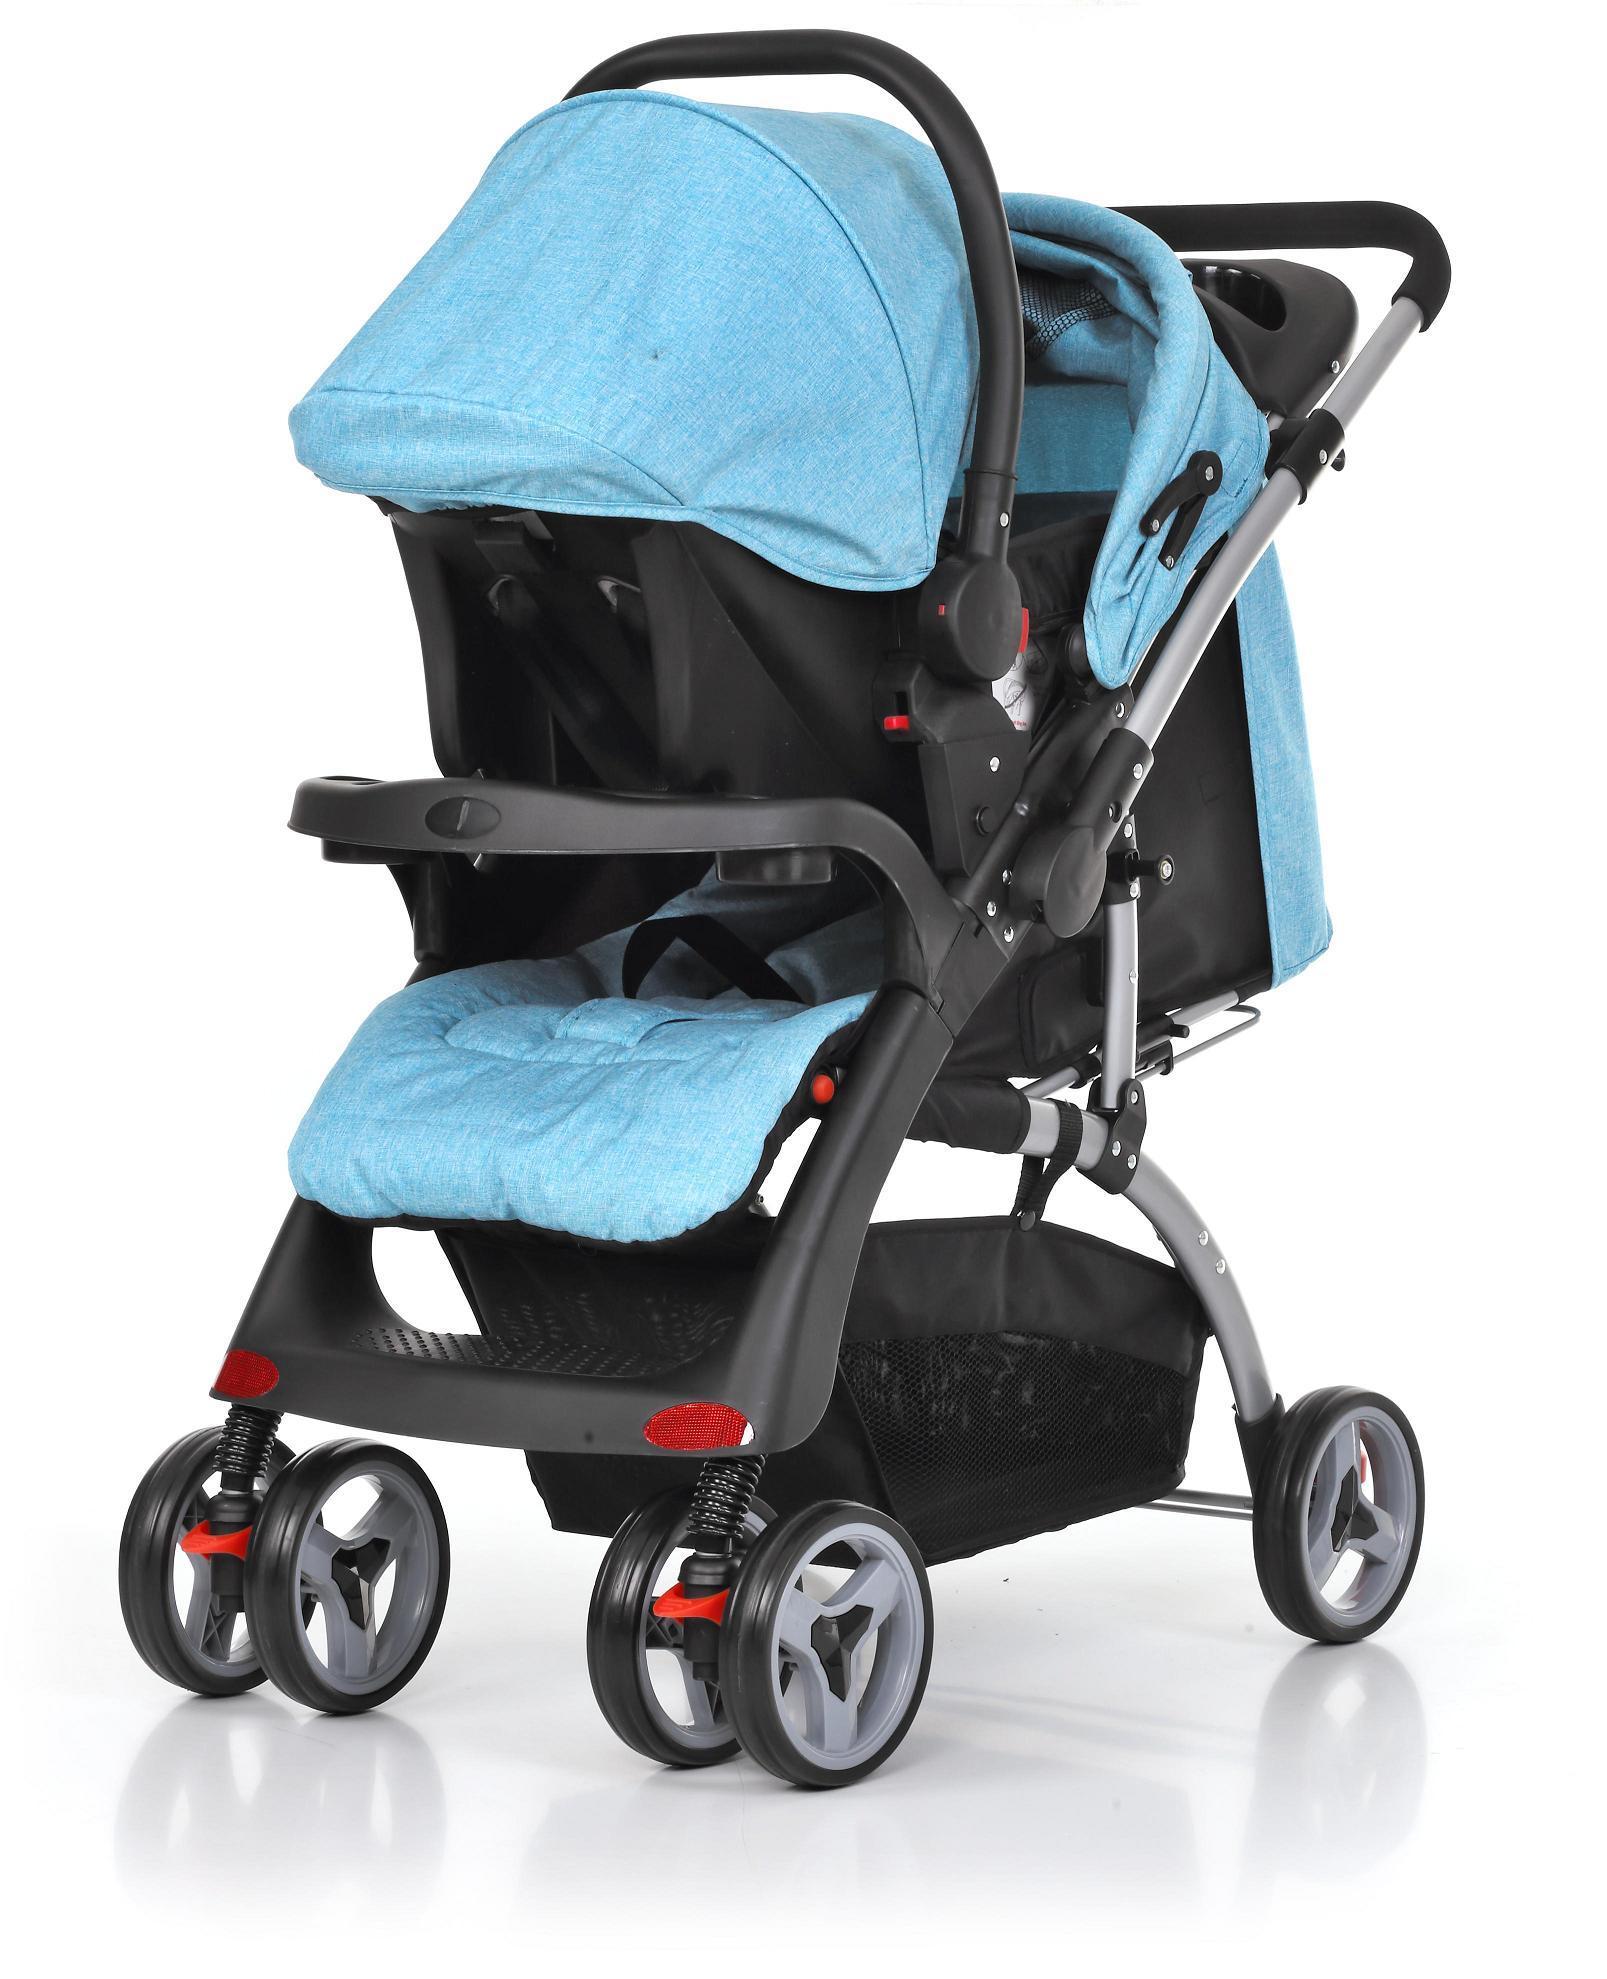 European Standard Luxury Fold Baby Pram with Car Seat